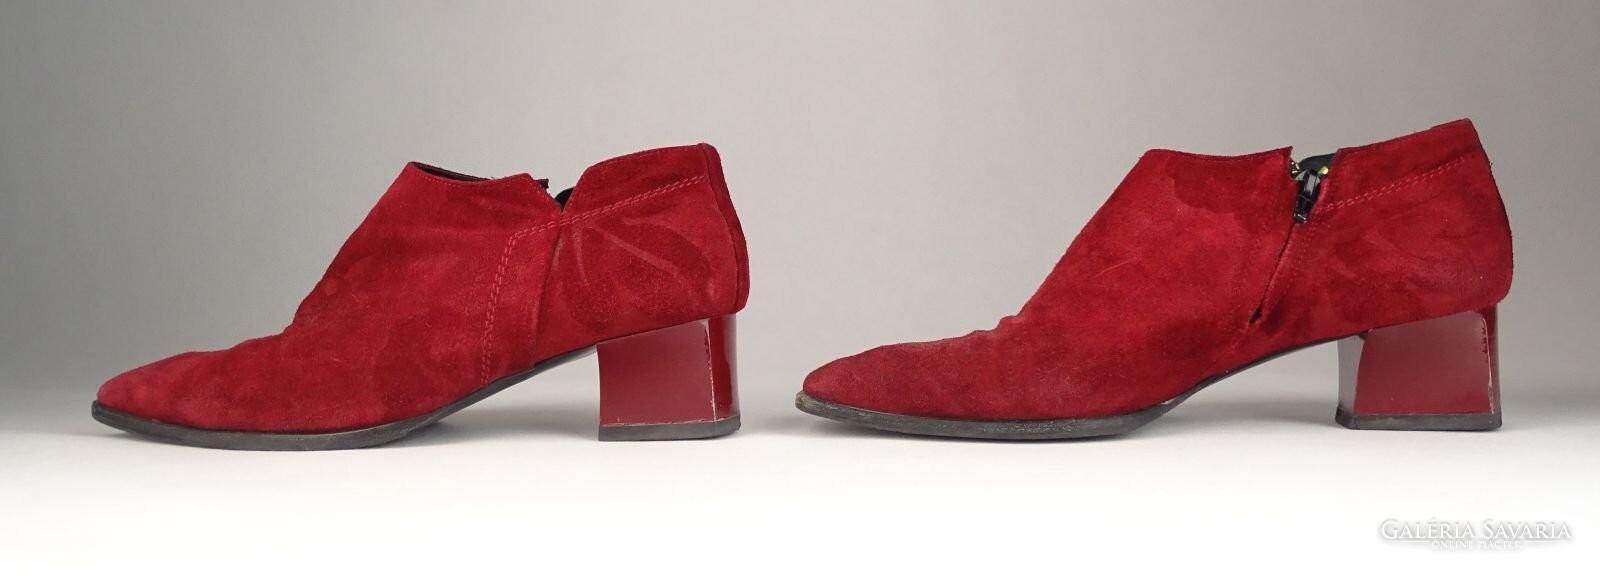 0V554 Bordó Cango Rinaldi női velúr cipő 39-es - Gardrób  5cd87c6bb5